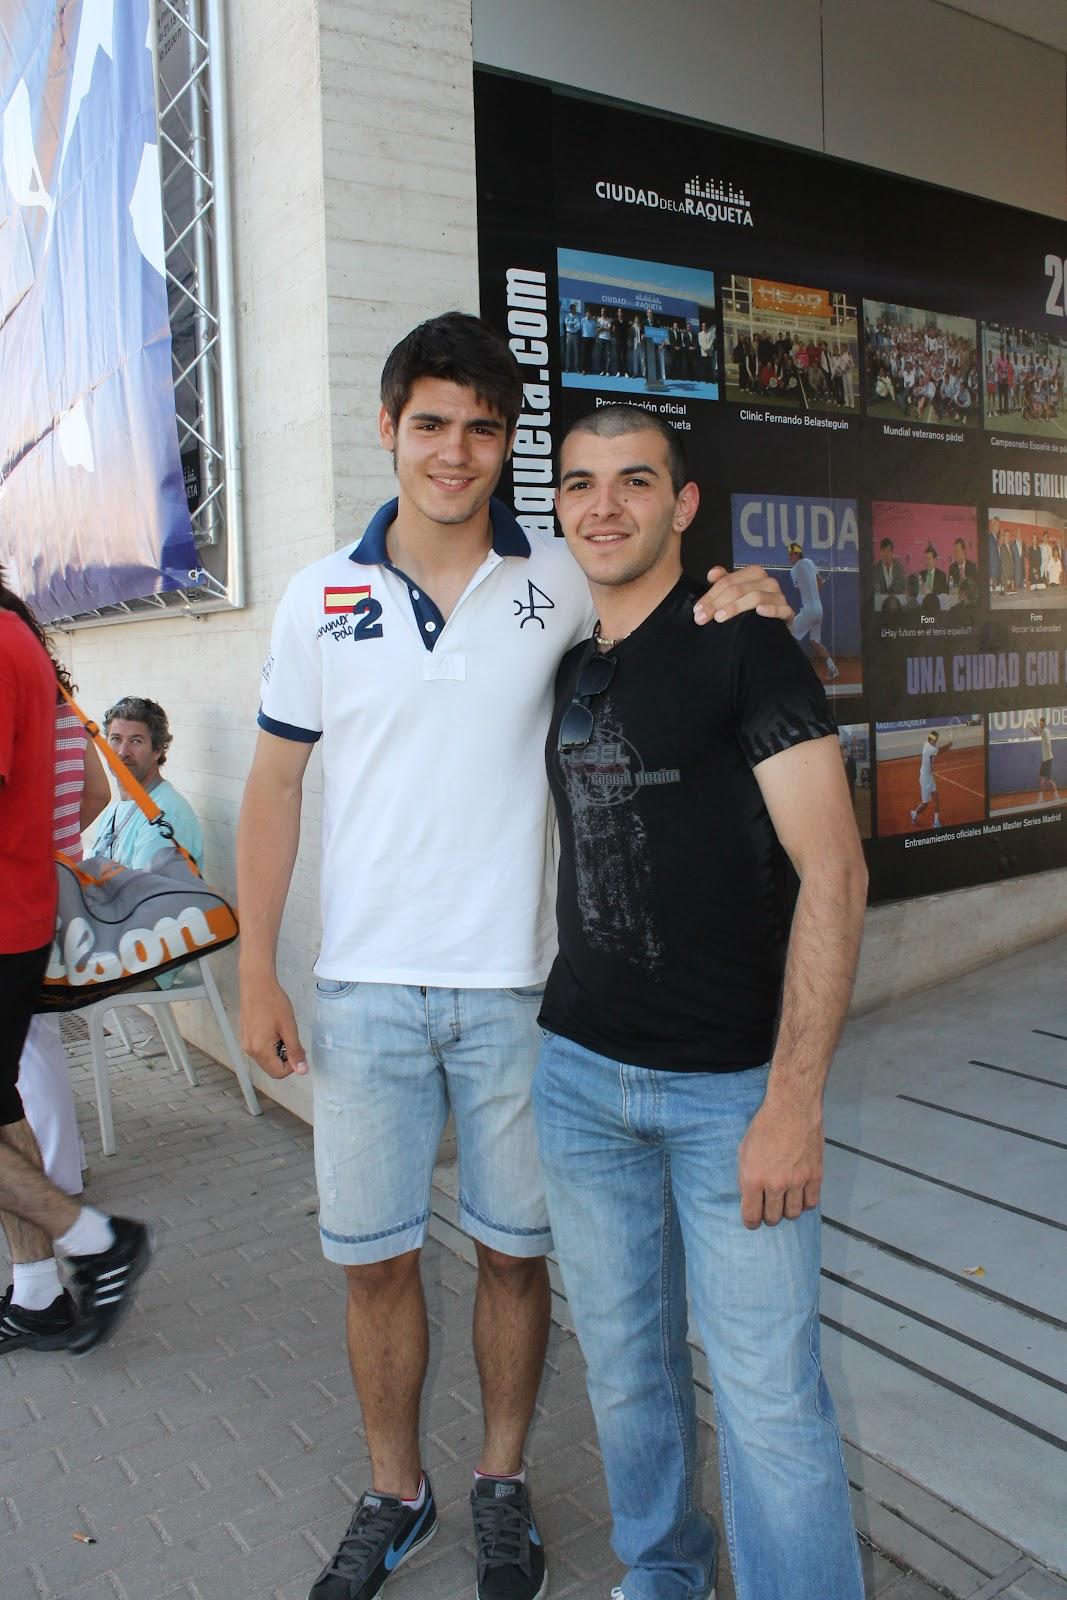 ¿Cuánto mide Álvaro Morata? - Real height Morata